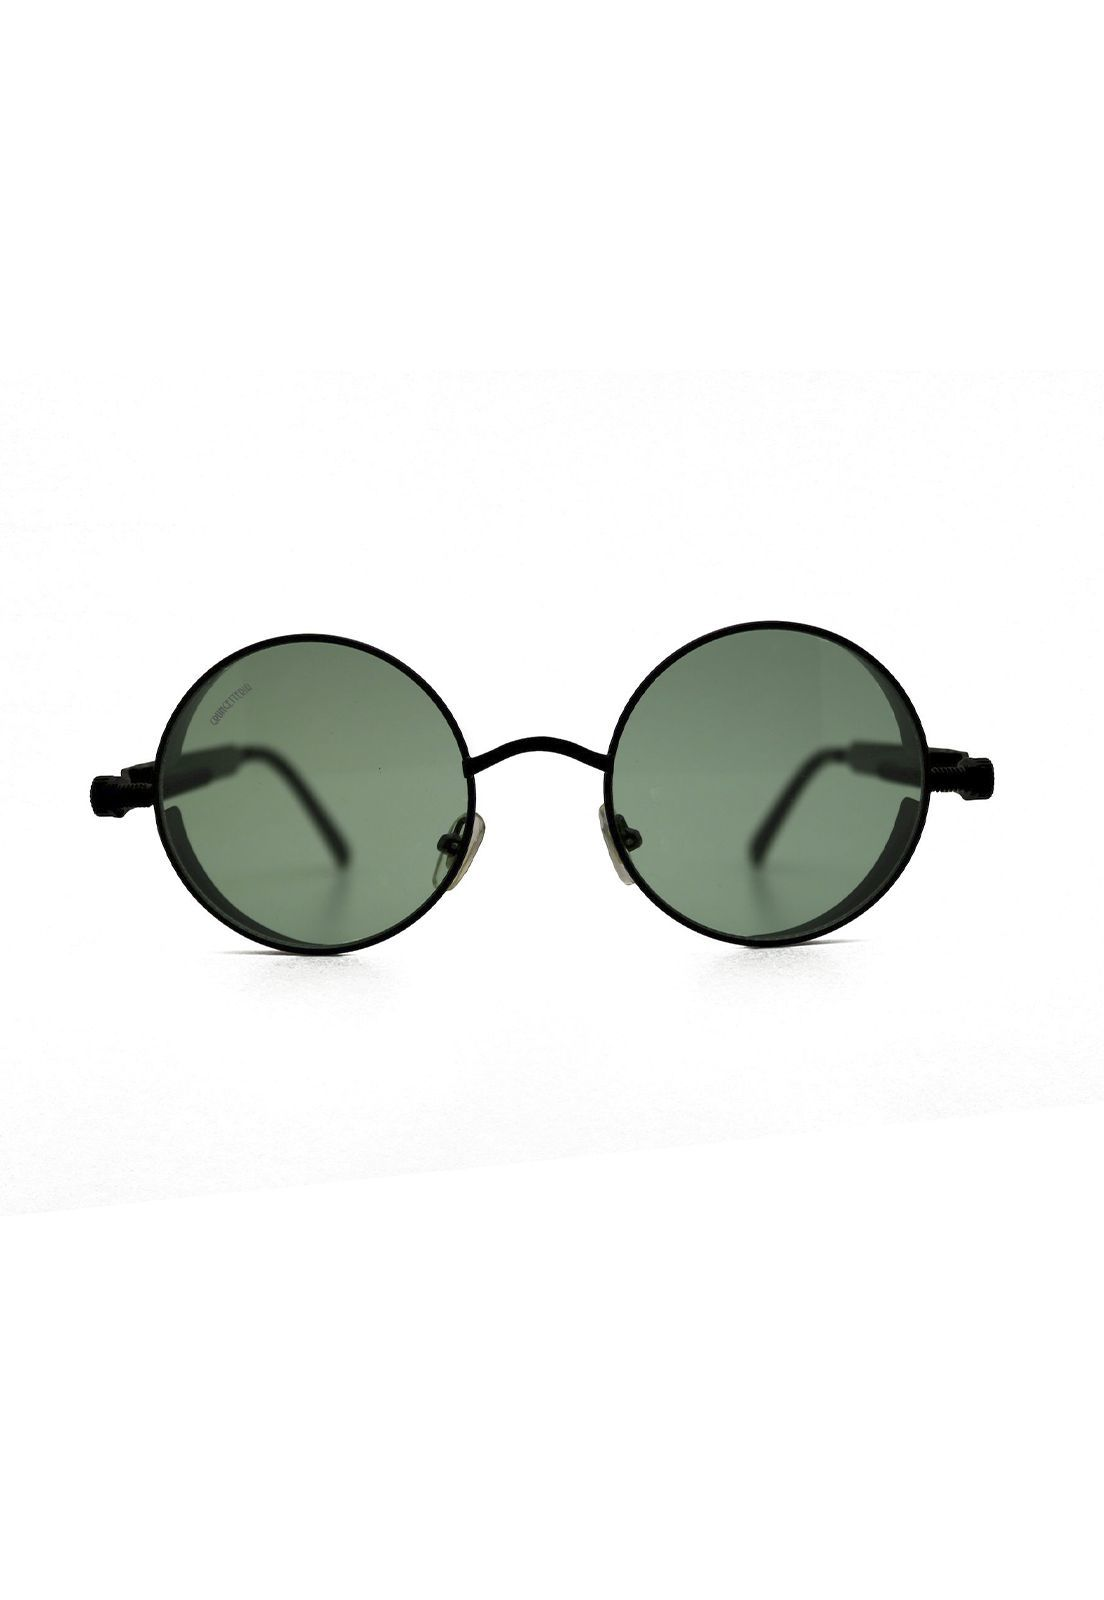 Óculos de Sol Grungetteria Sex Machine Verde